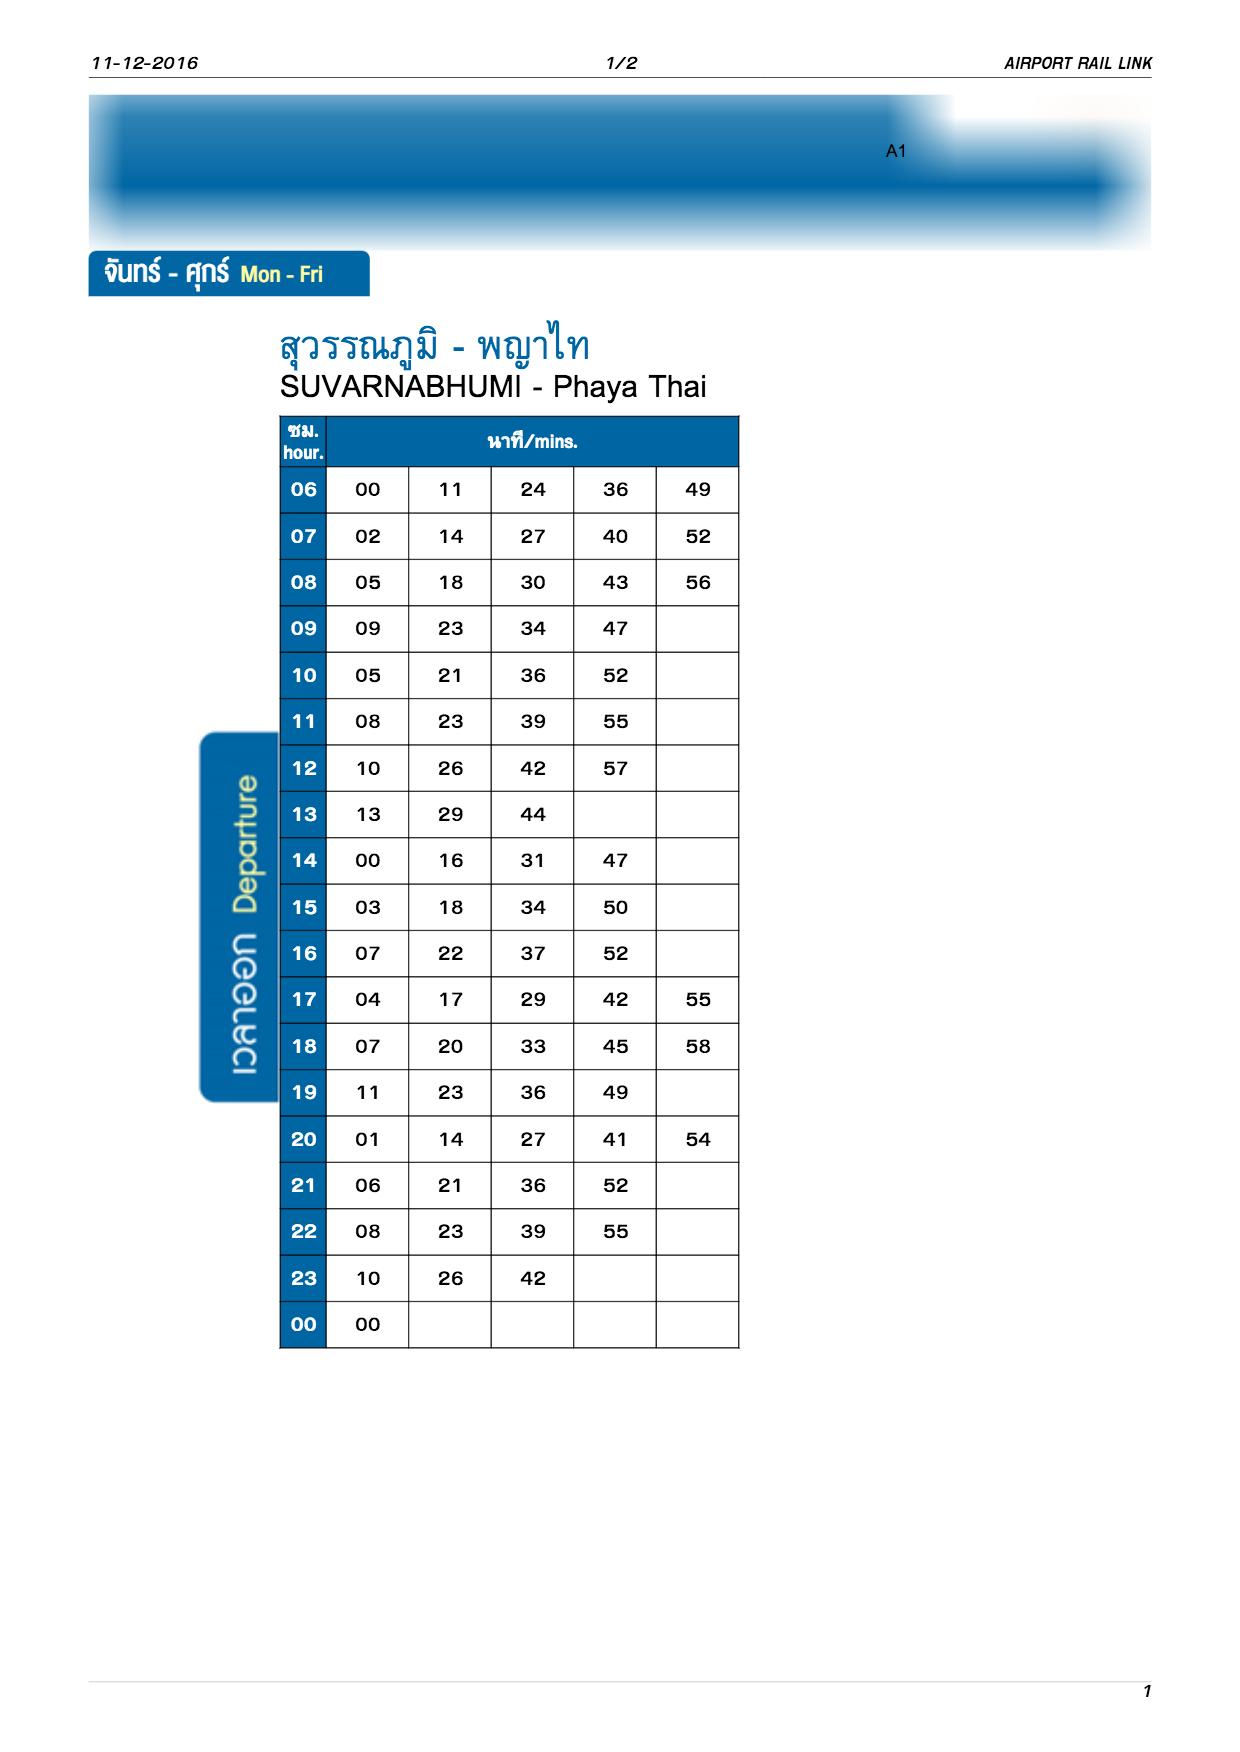 bangkok-airport-rail-link-timetable.png